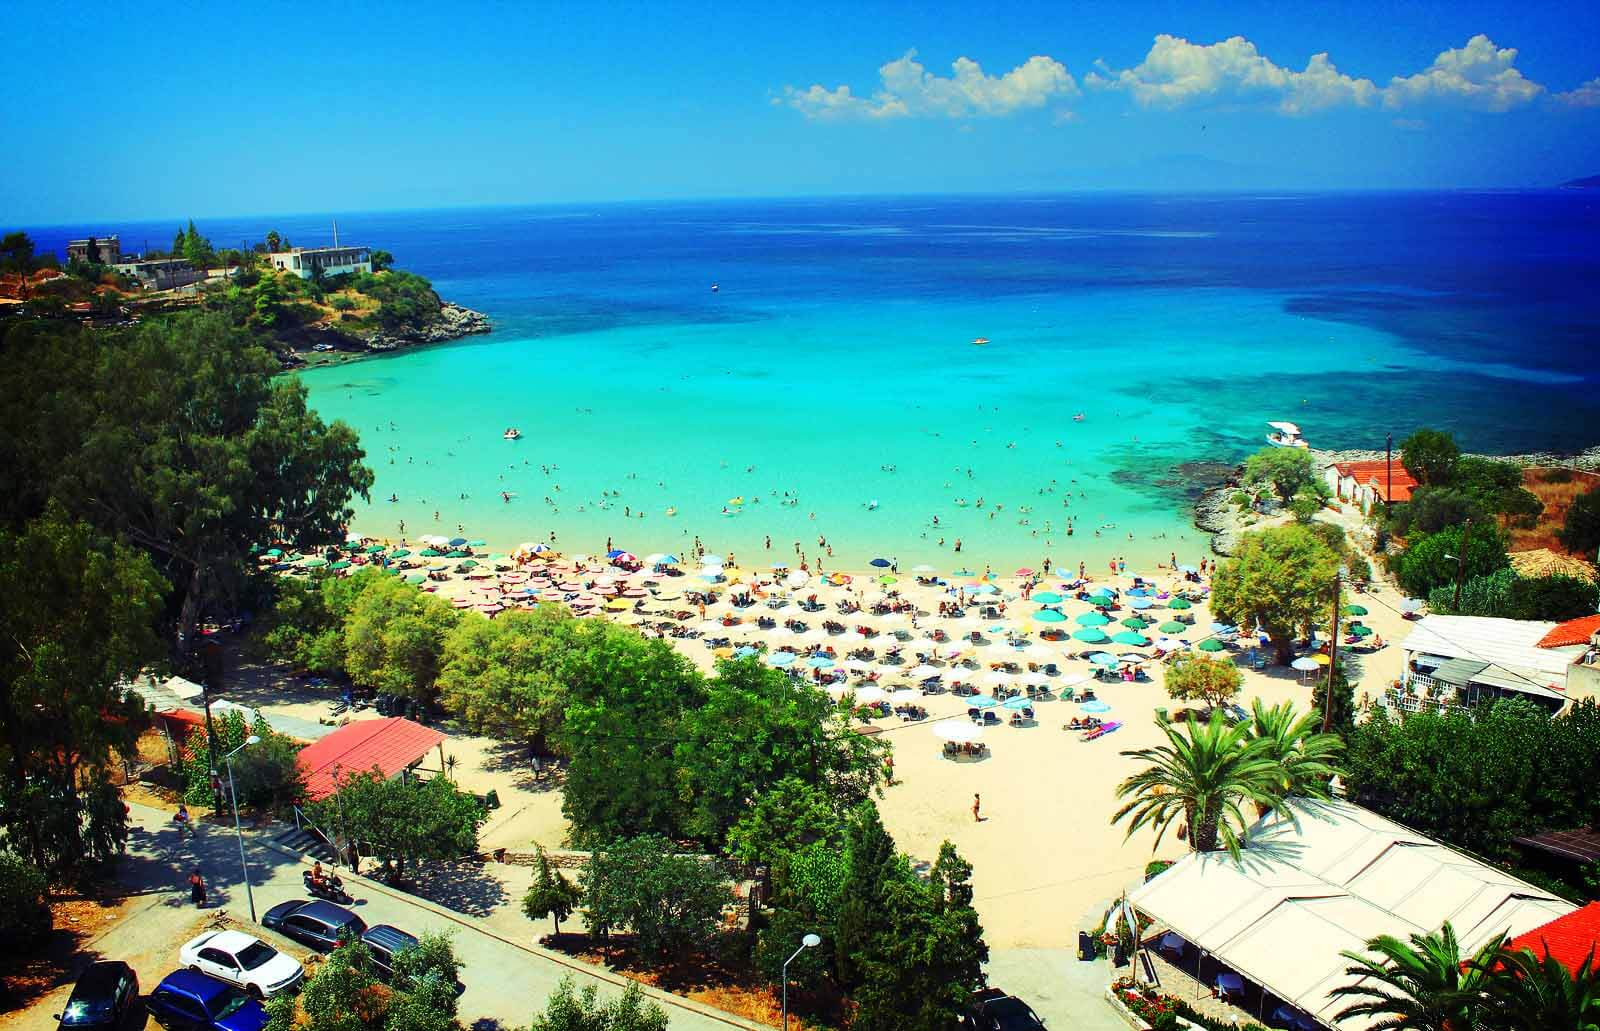 Kalamata Hotels On The Beach